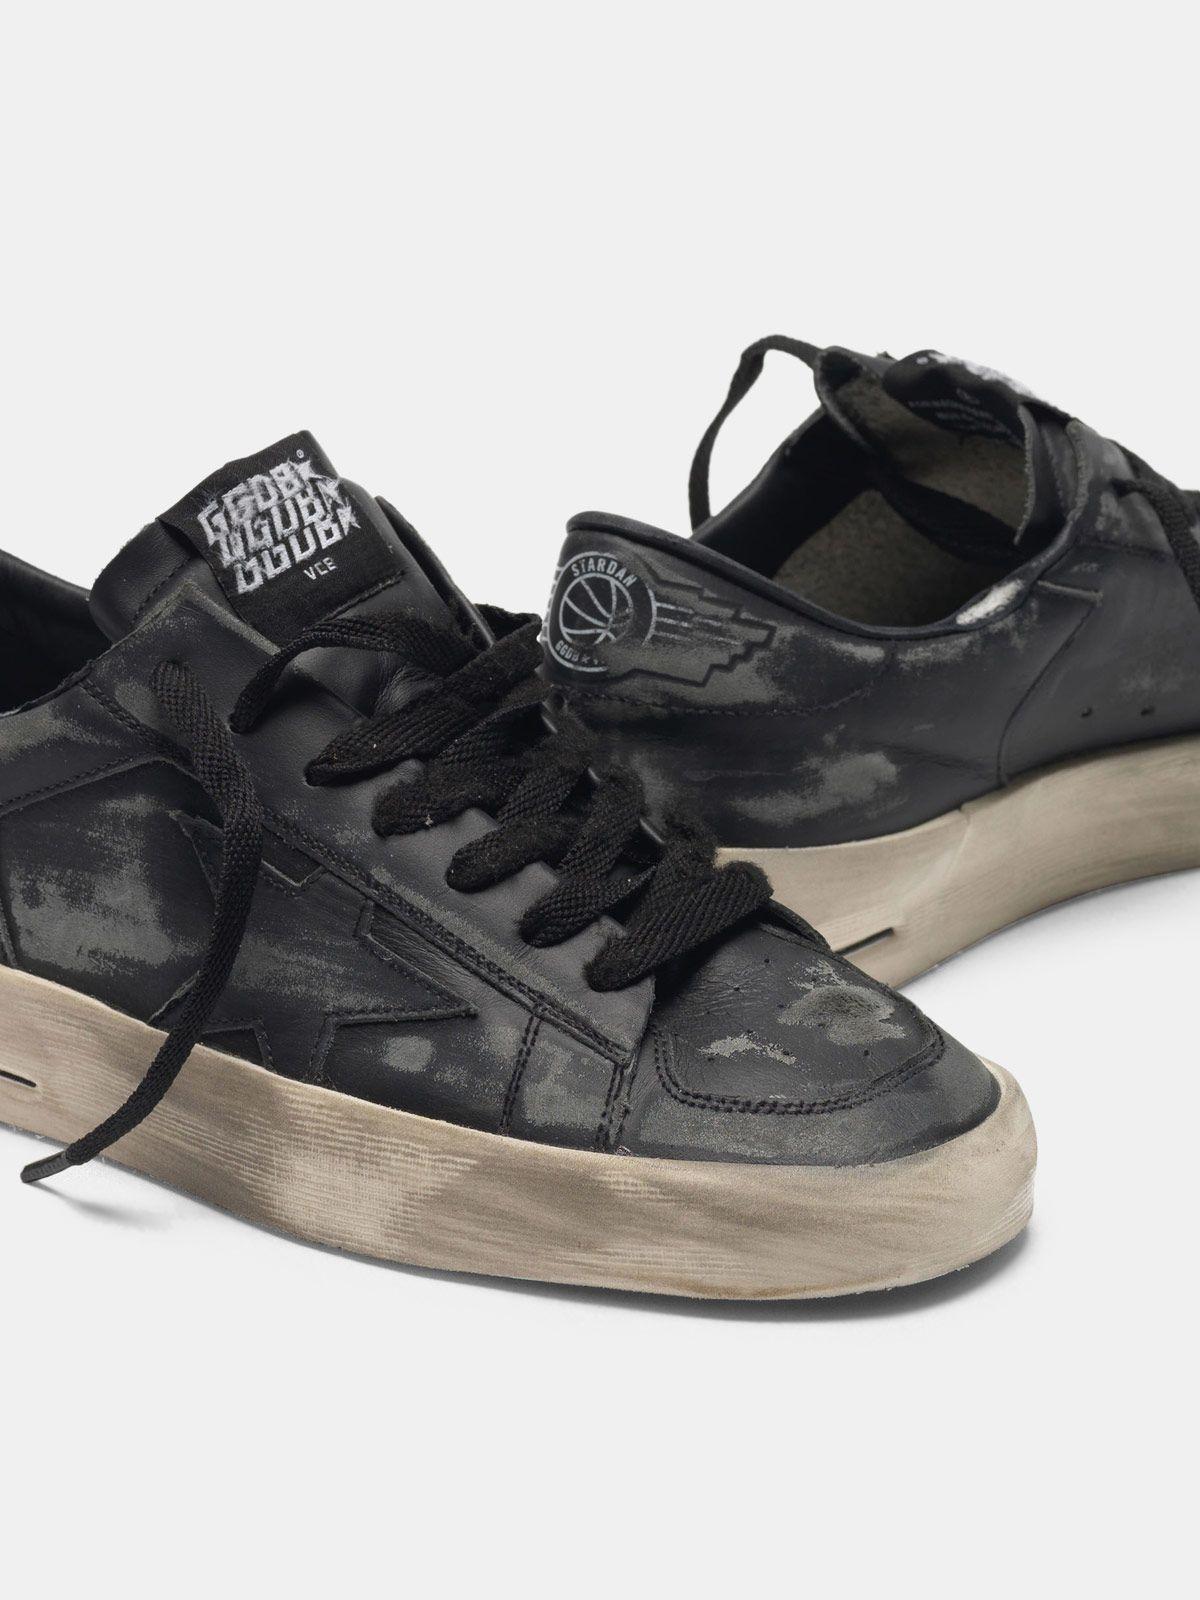 Golden Goose - Stardan LTD sneakers in total black leather  in